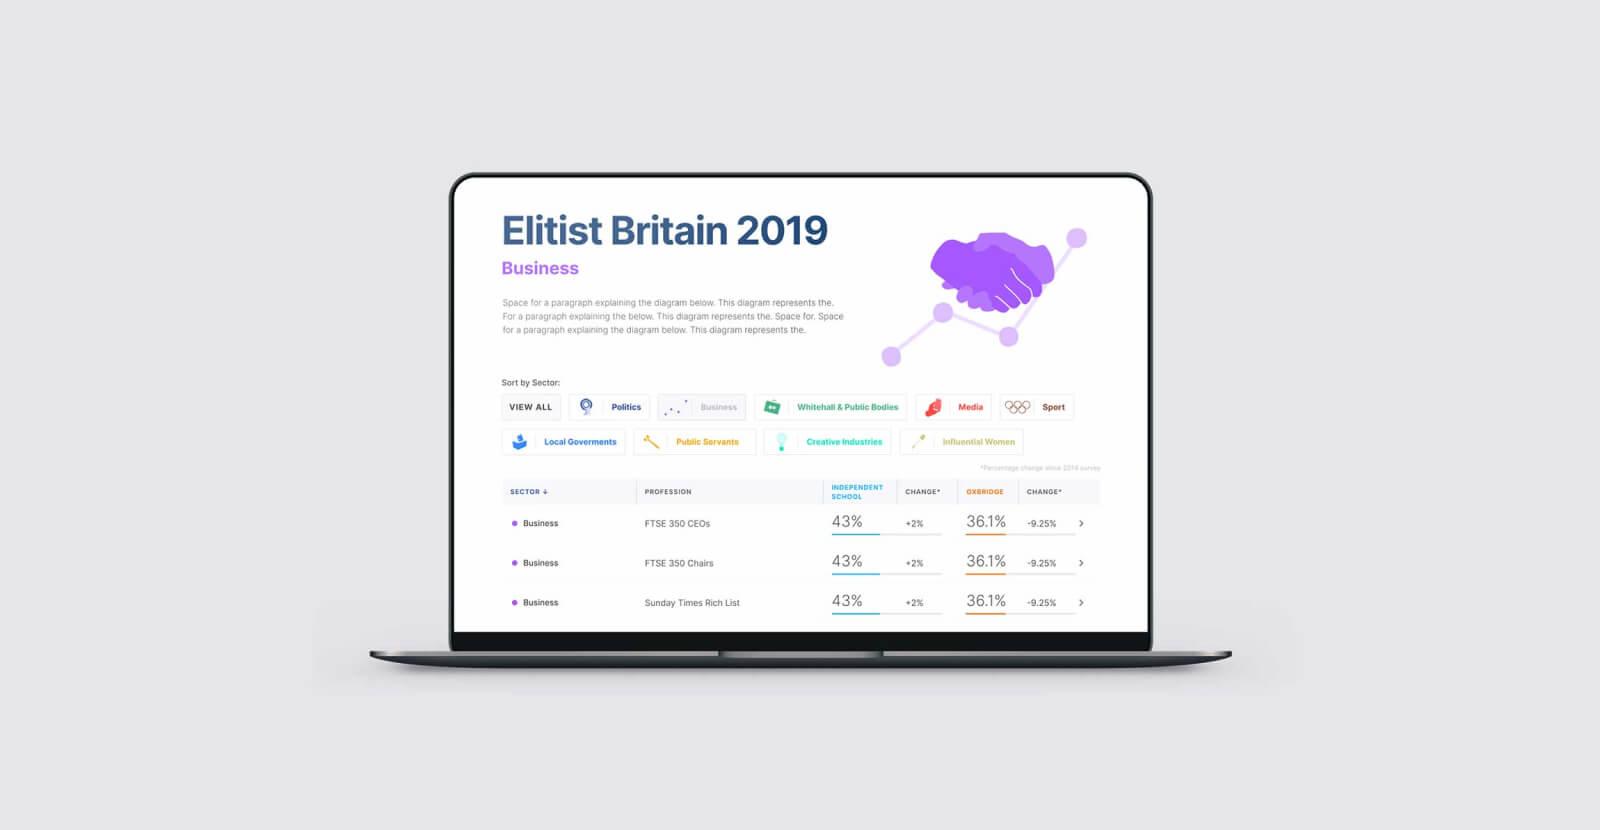 elitist britain website screenshot